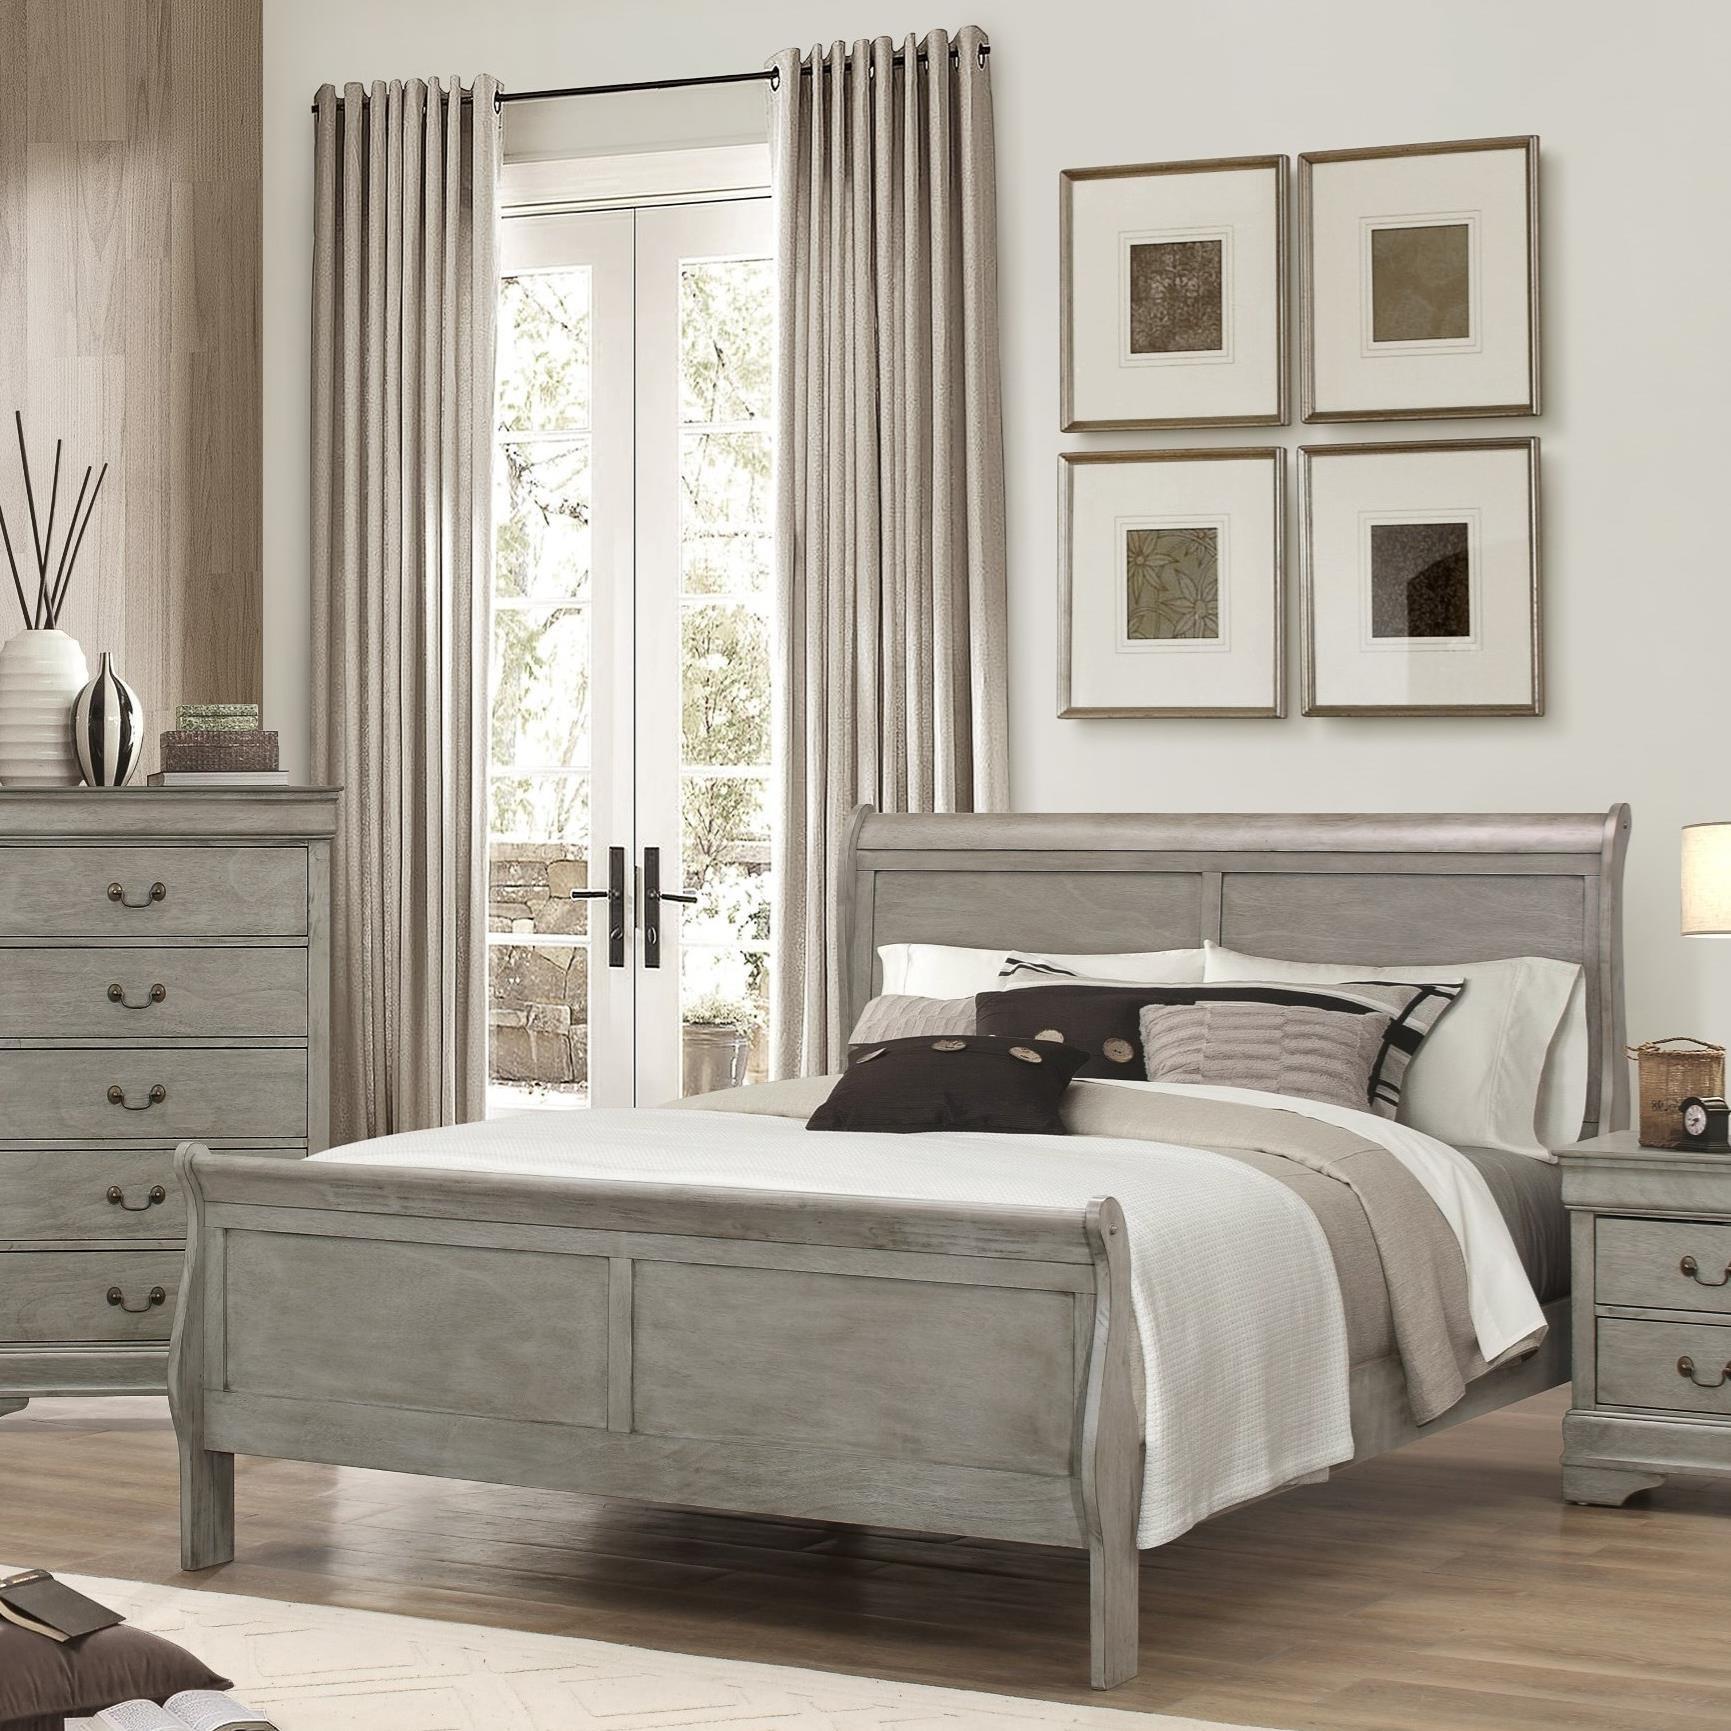 Crown Mark Louis Phillipe Full Bed - Item Number: B3500-F-HBFB+RAIL